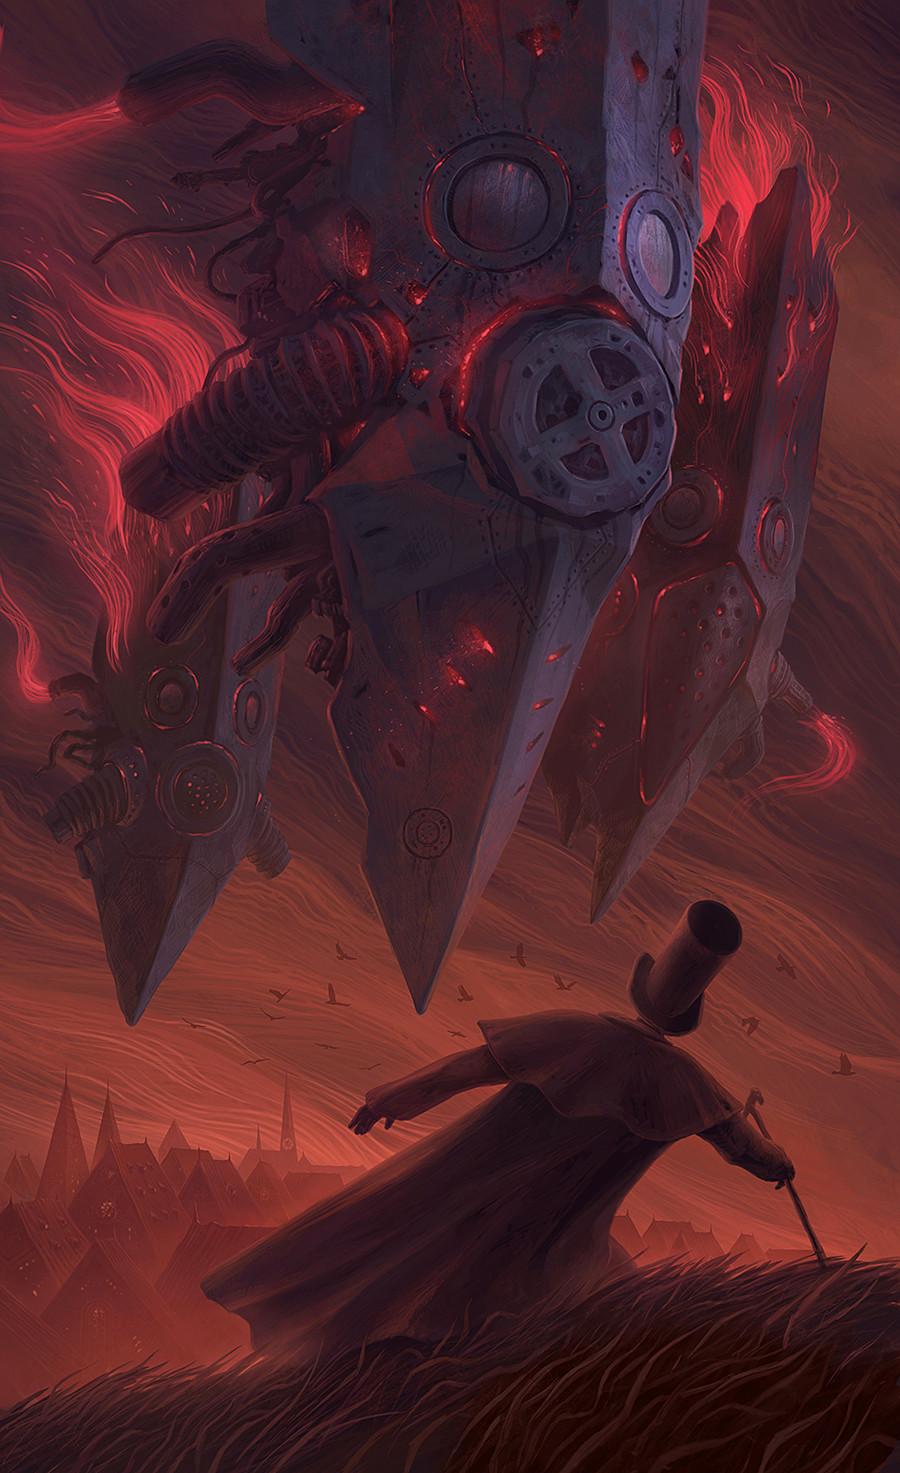 Digital Art Fantasy Art Alexey Egorov Clouds Red Red Sky Top Hat Fantasy City 900x1473